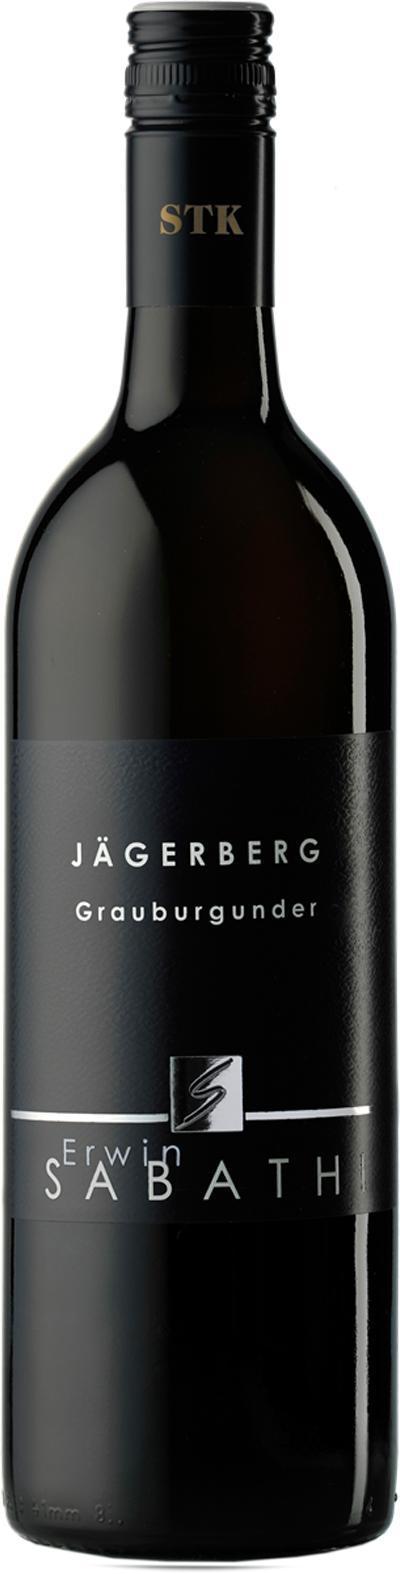 Grauburgunder Jägerberg Erste STK  2018 / Sabathi Erwin